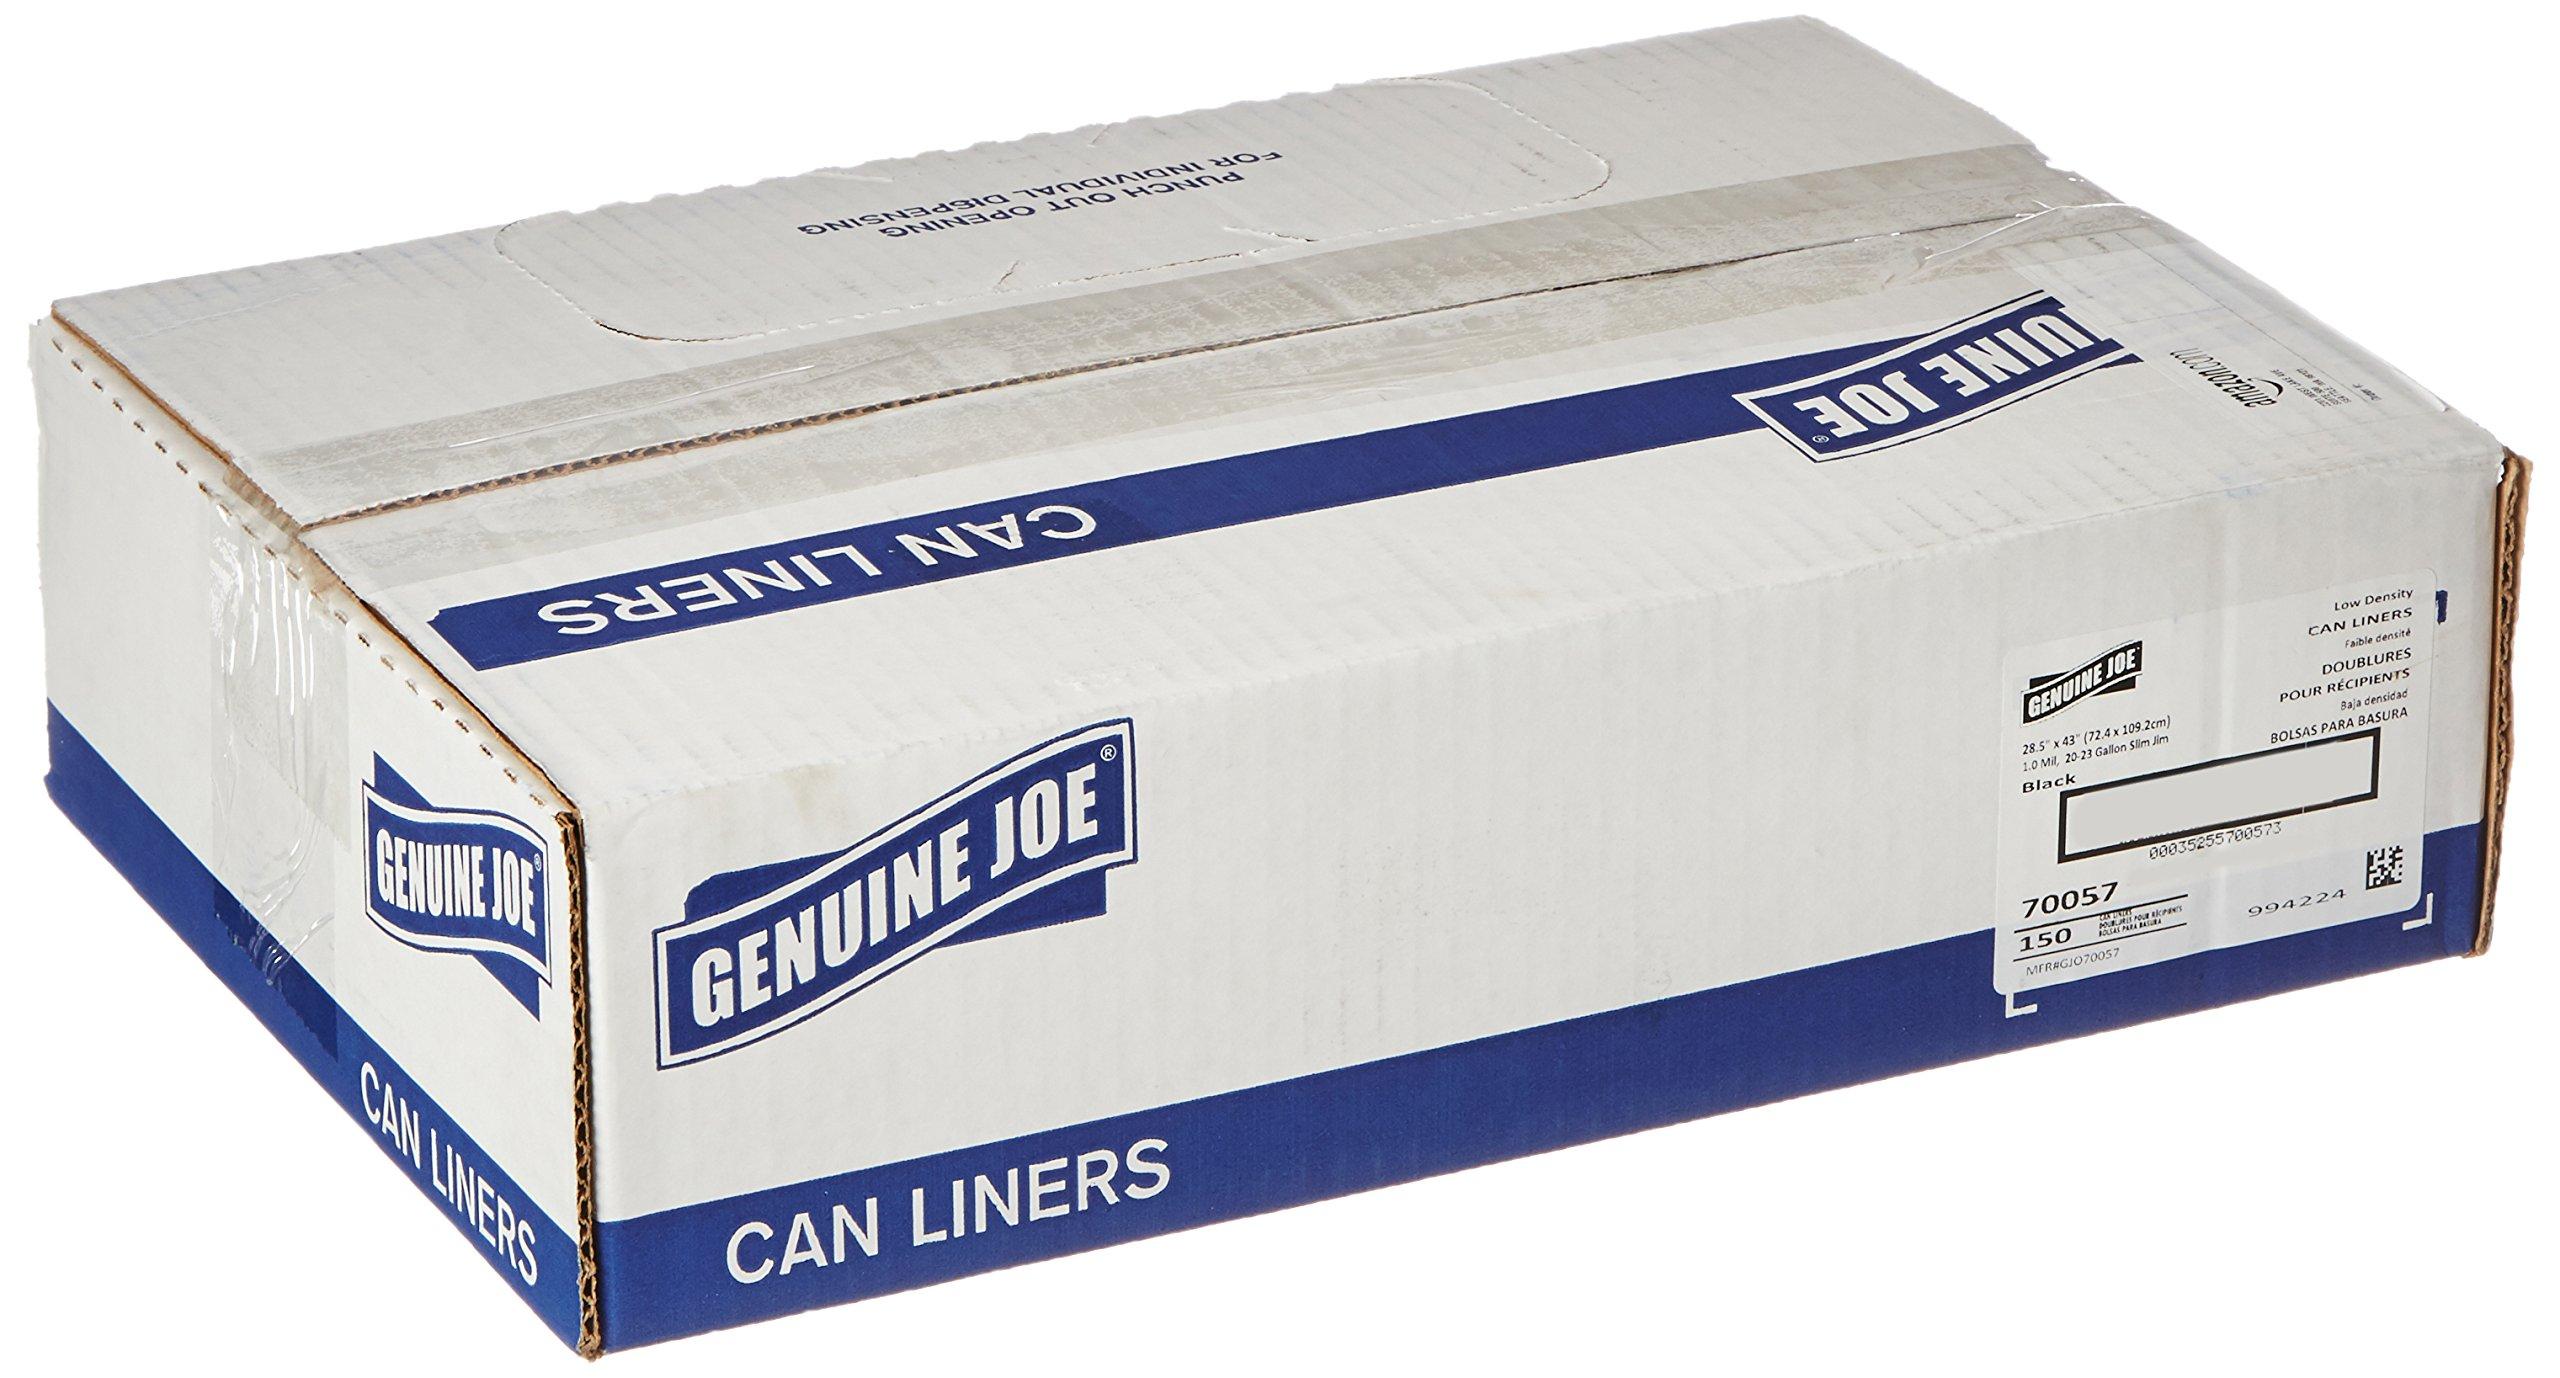 Genuine Joe GJO70057 Slim Jim Can Liners, Low Density, 23 gal, 43'' x 28.50'', 150/Box, Black